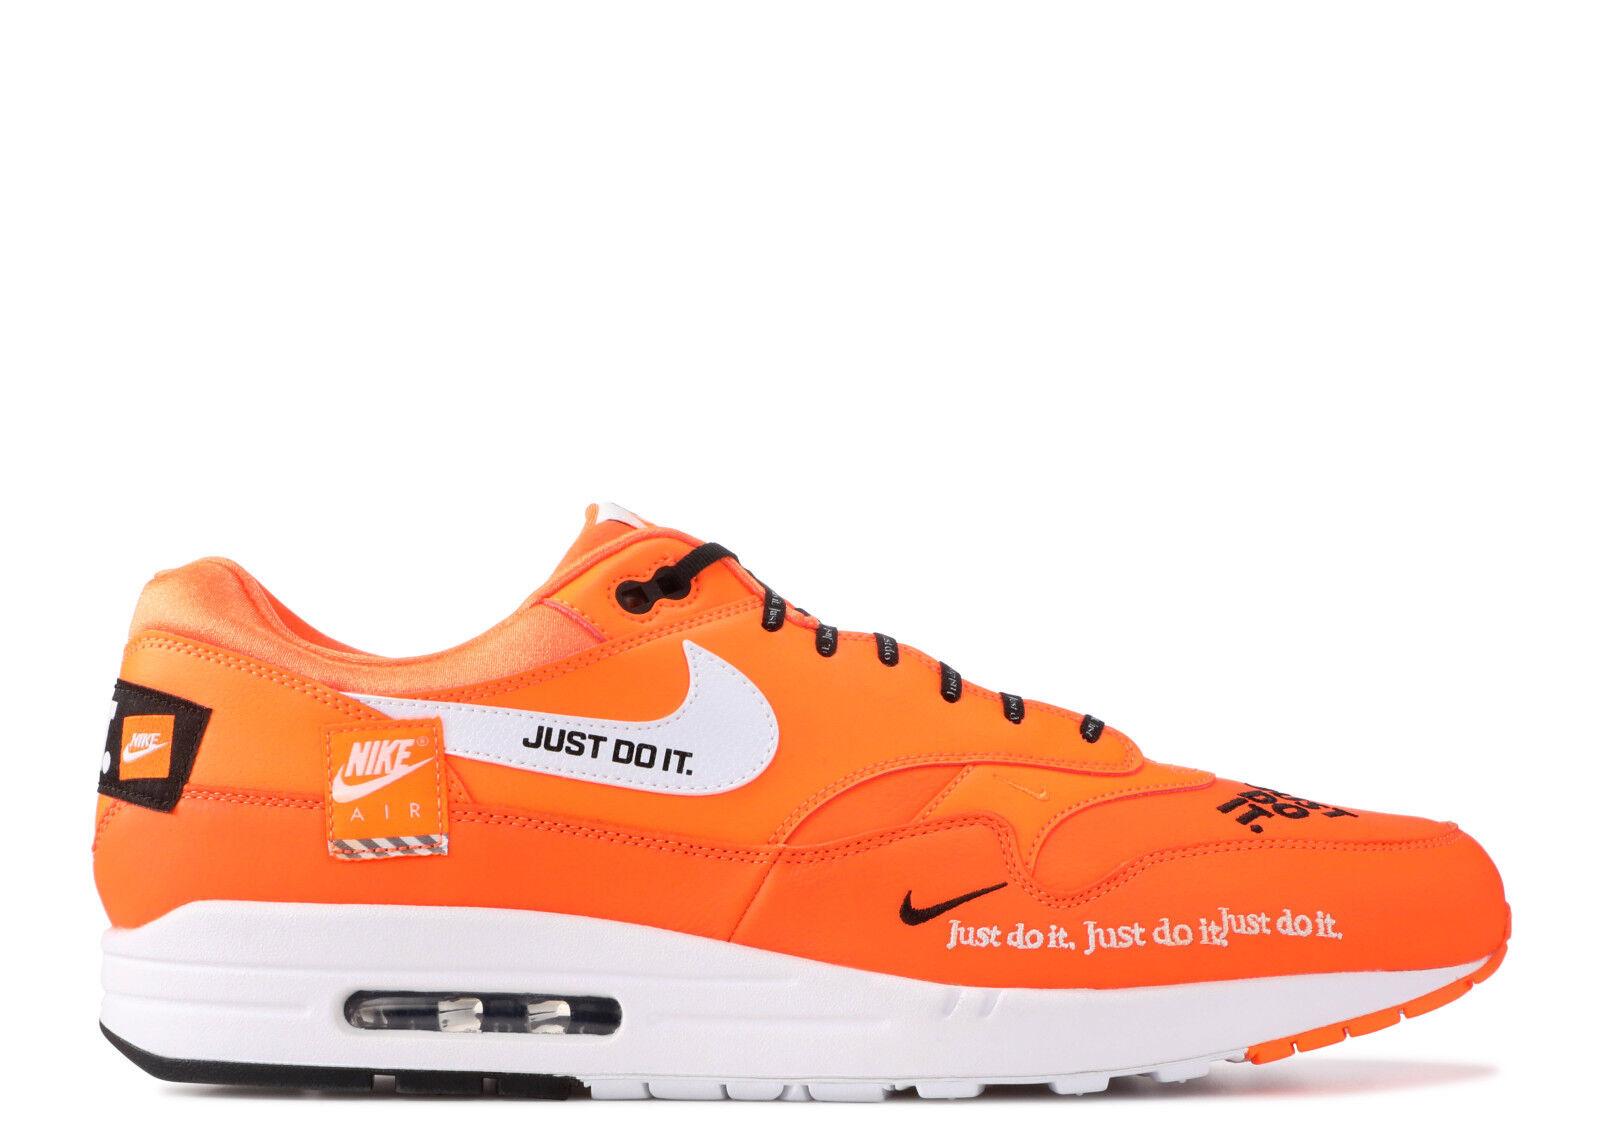 Hombre nike air max 1 Collection se naranja hazlo Collection 1 ef1efb